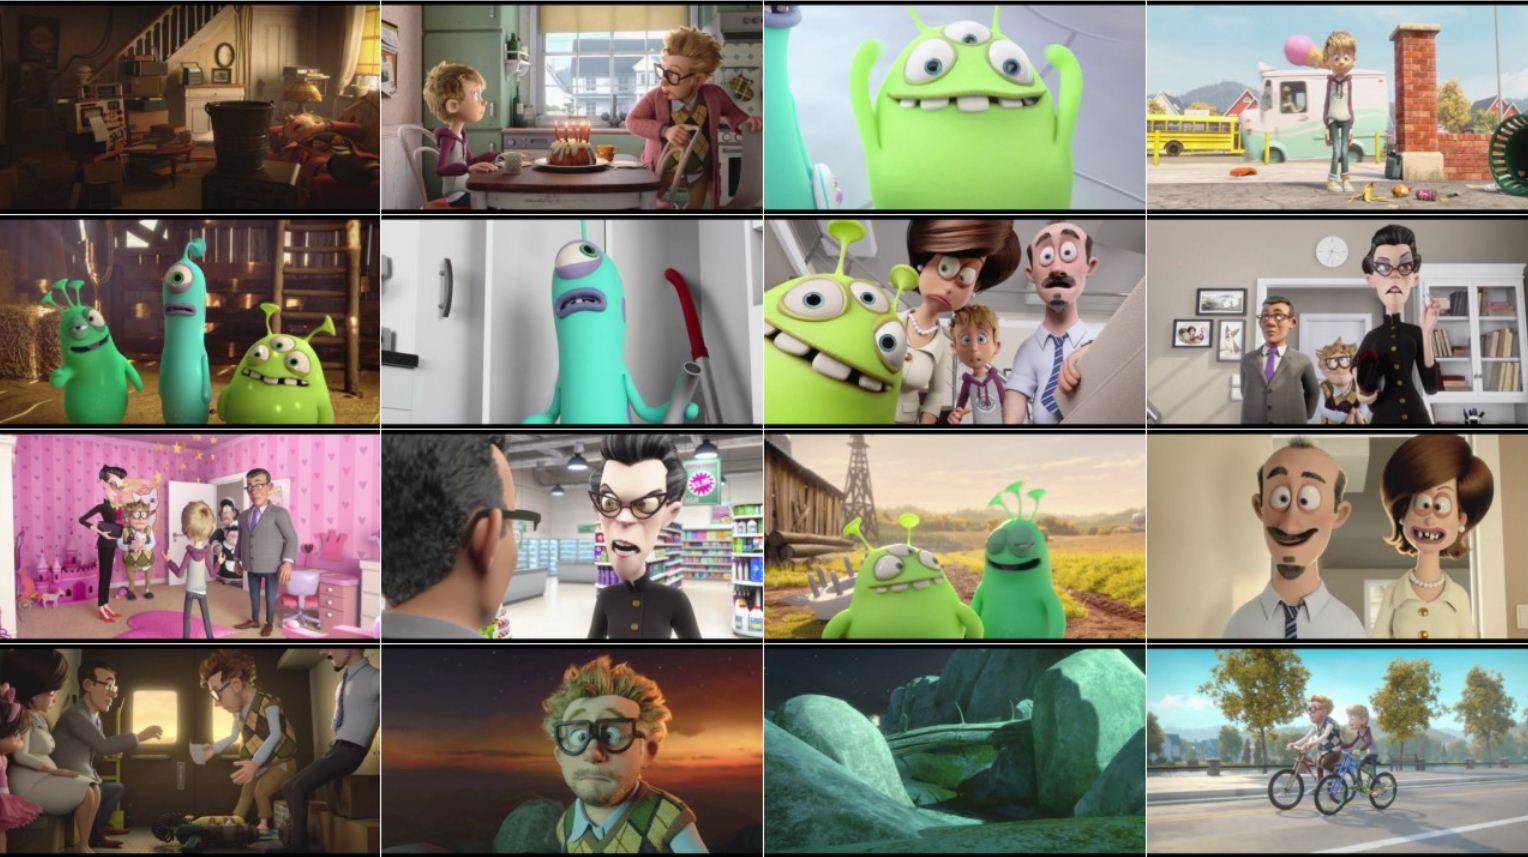 Luis The Aliens 2018 2 دانلود دوبله فارسی انیمیشن Luis and The Aliens 2018